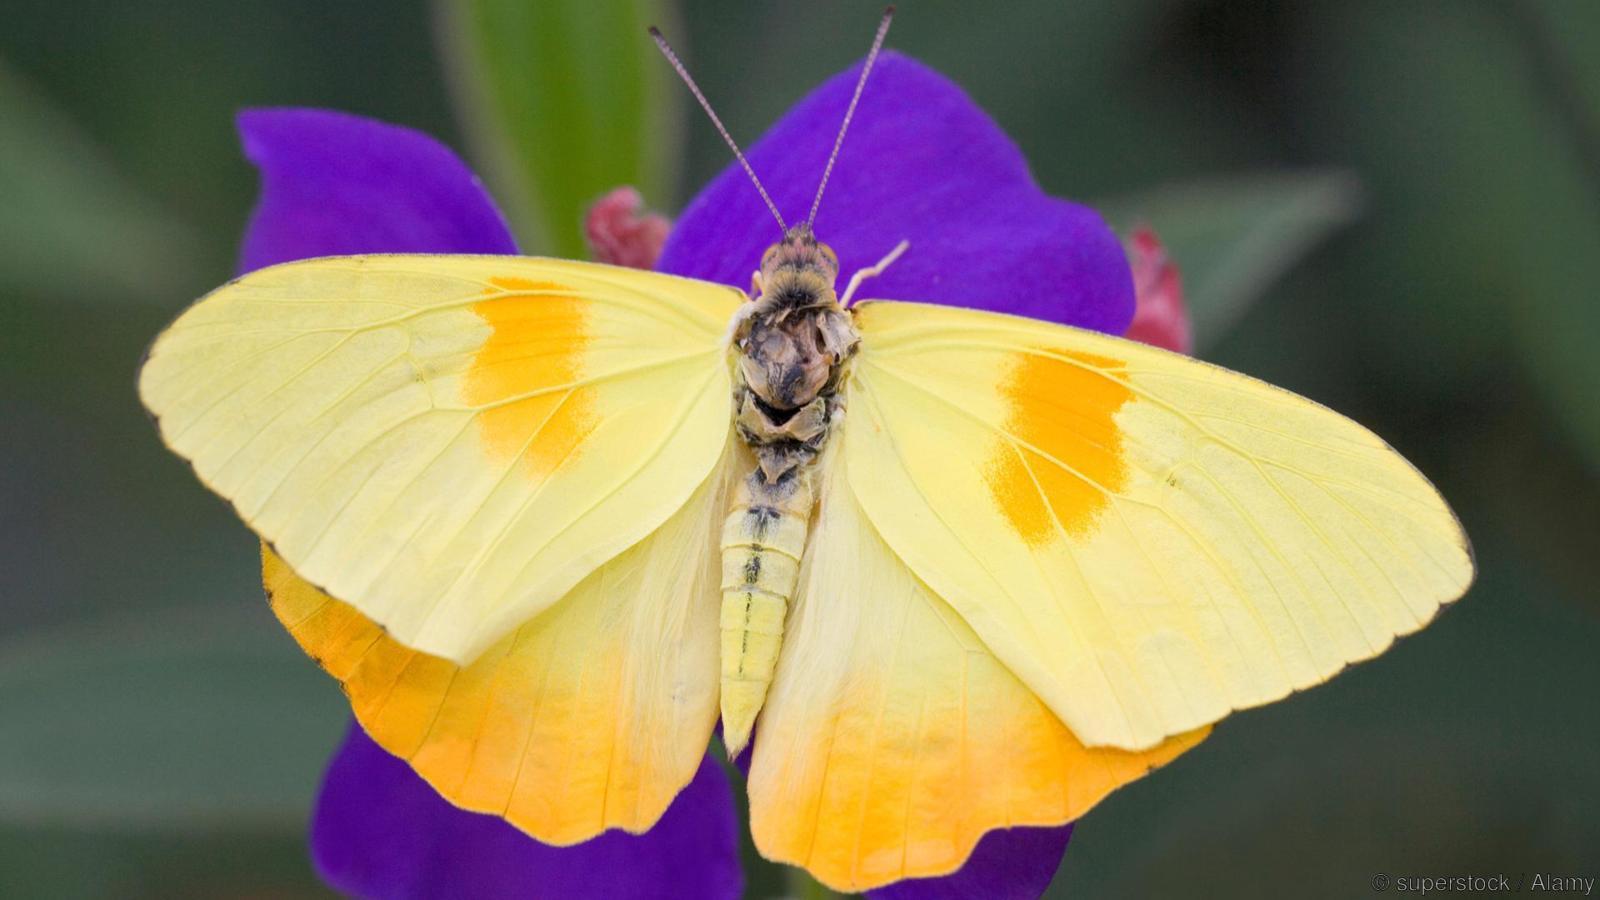 Orange-Barred Sulphur butterfly (Phoebis philea) pollinating a flower